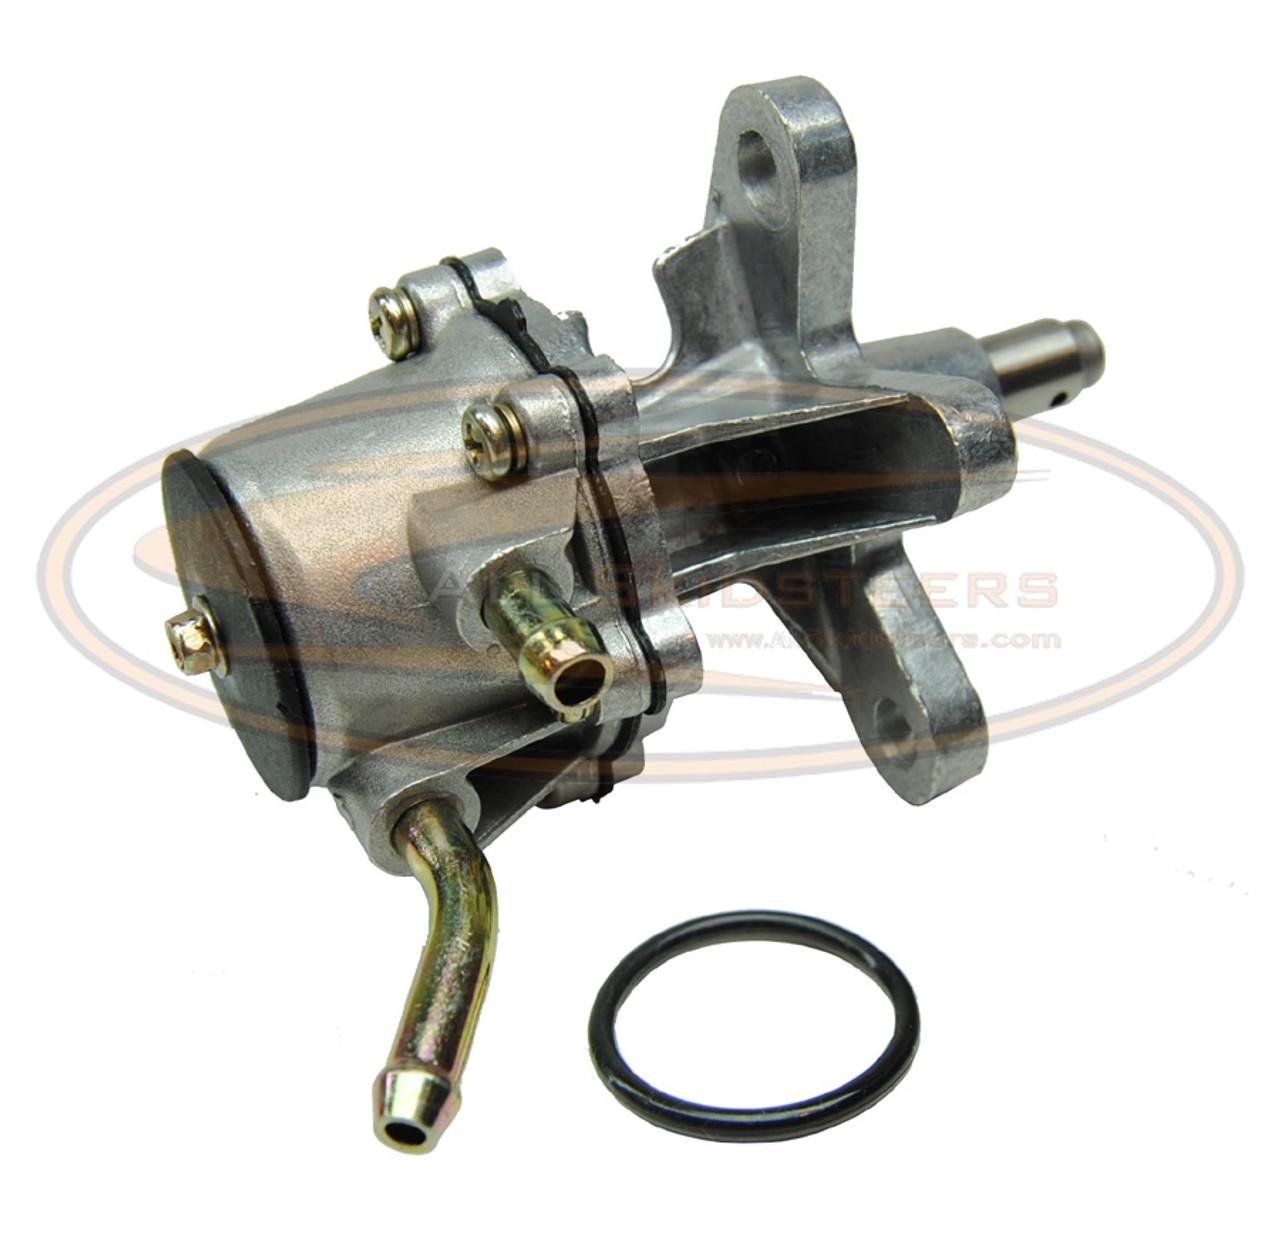 Diesel Fuel Pump Deutz Engines For Gehl Replaces Oem 133462 Filters Flf Bflfl Bflf Fm Bfmf Fmf